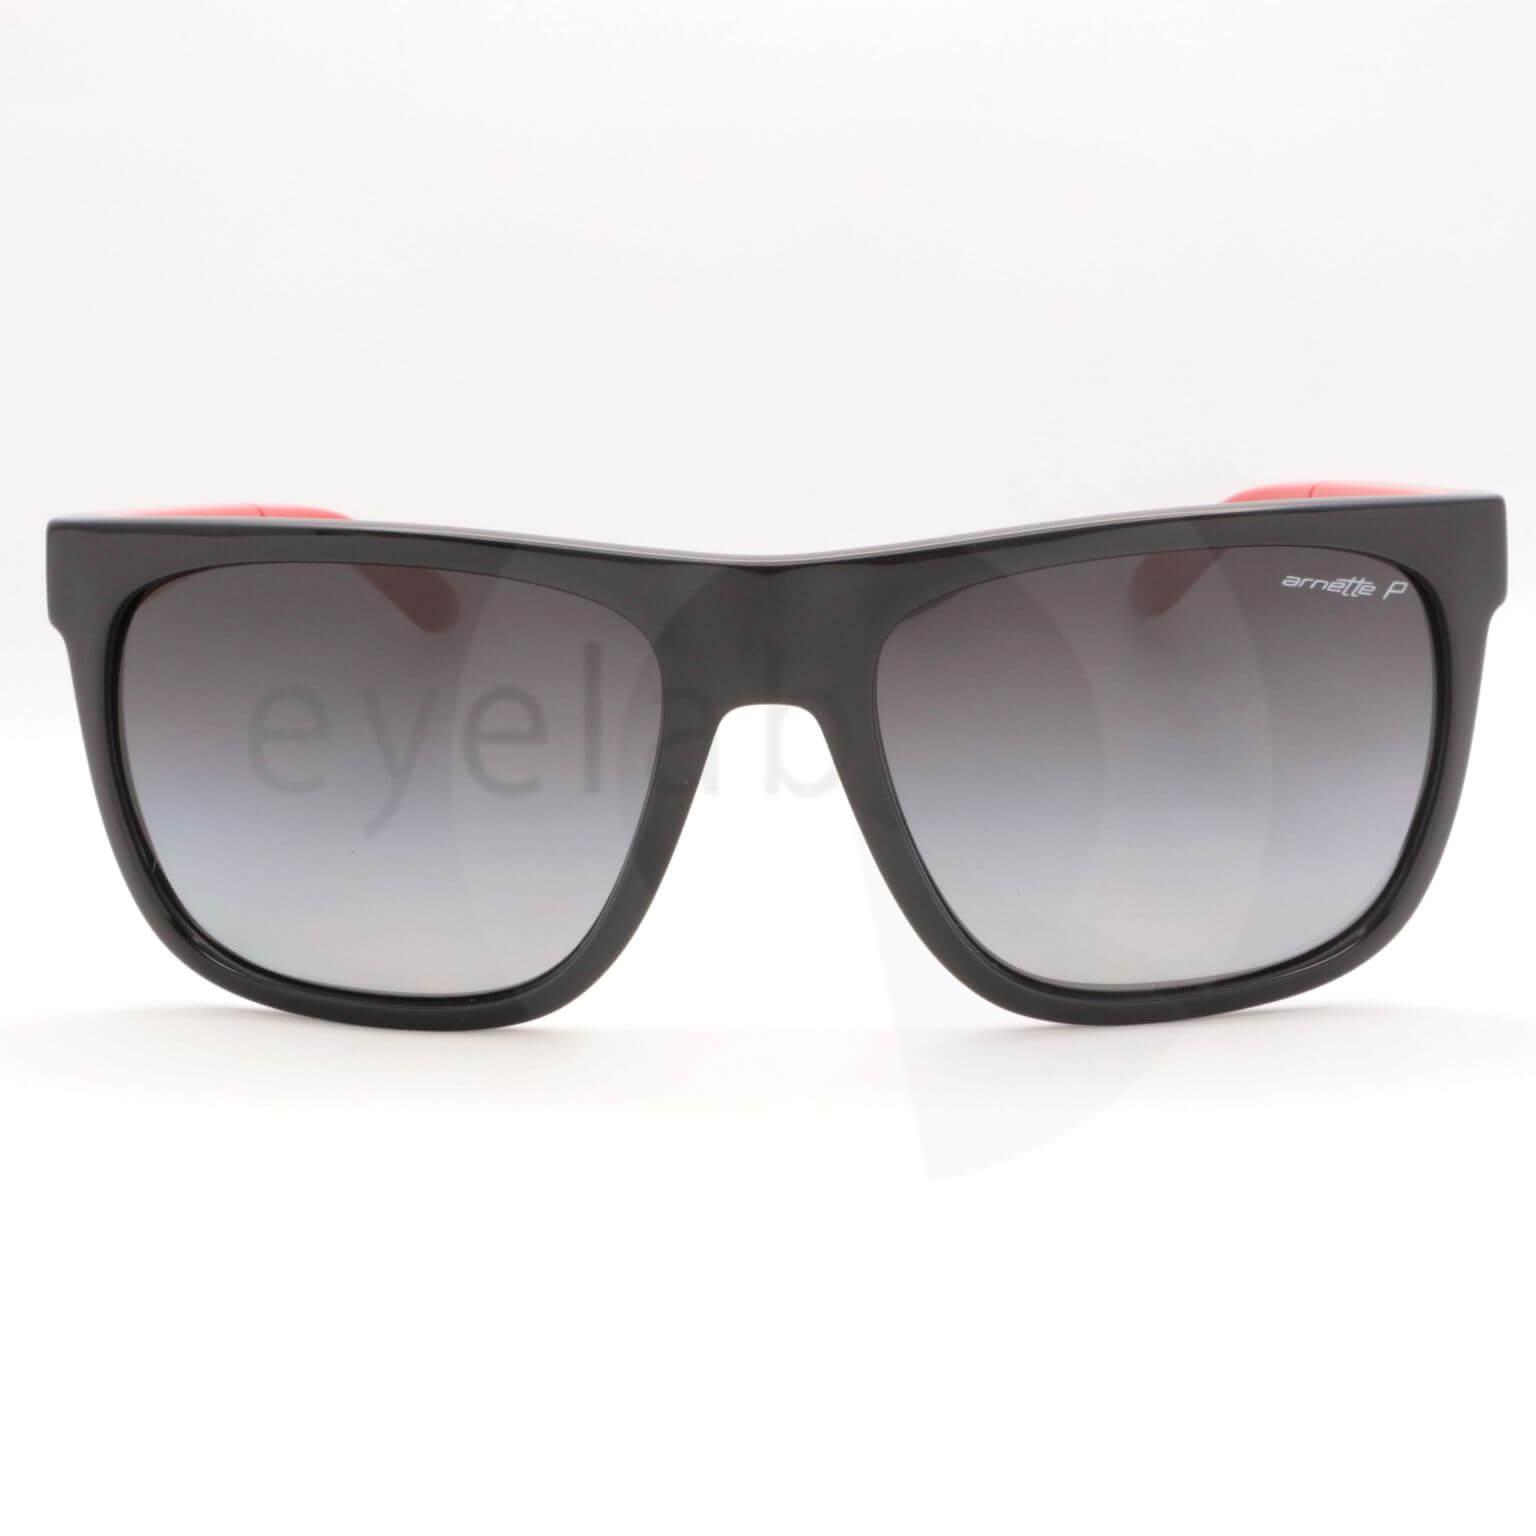 e467887168 Arnette Fire Drill 4143 41T3 59 ~ Οπτικά Eyelab